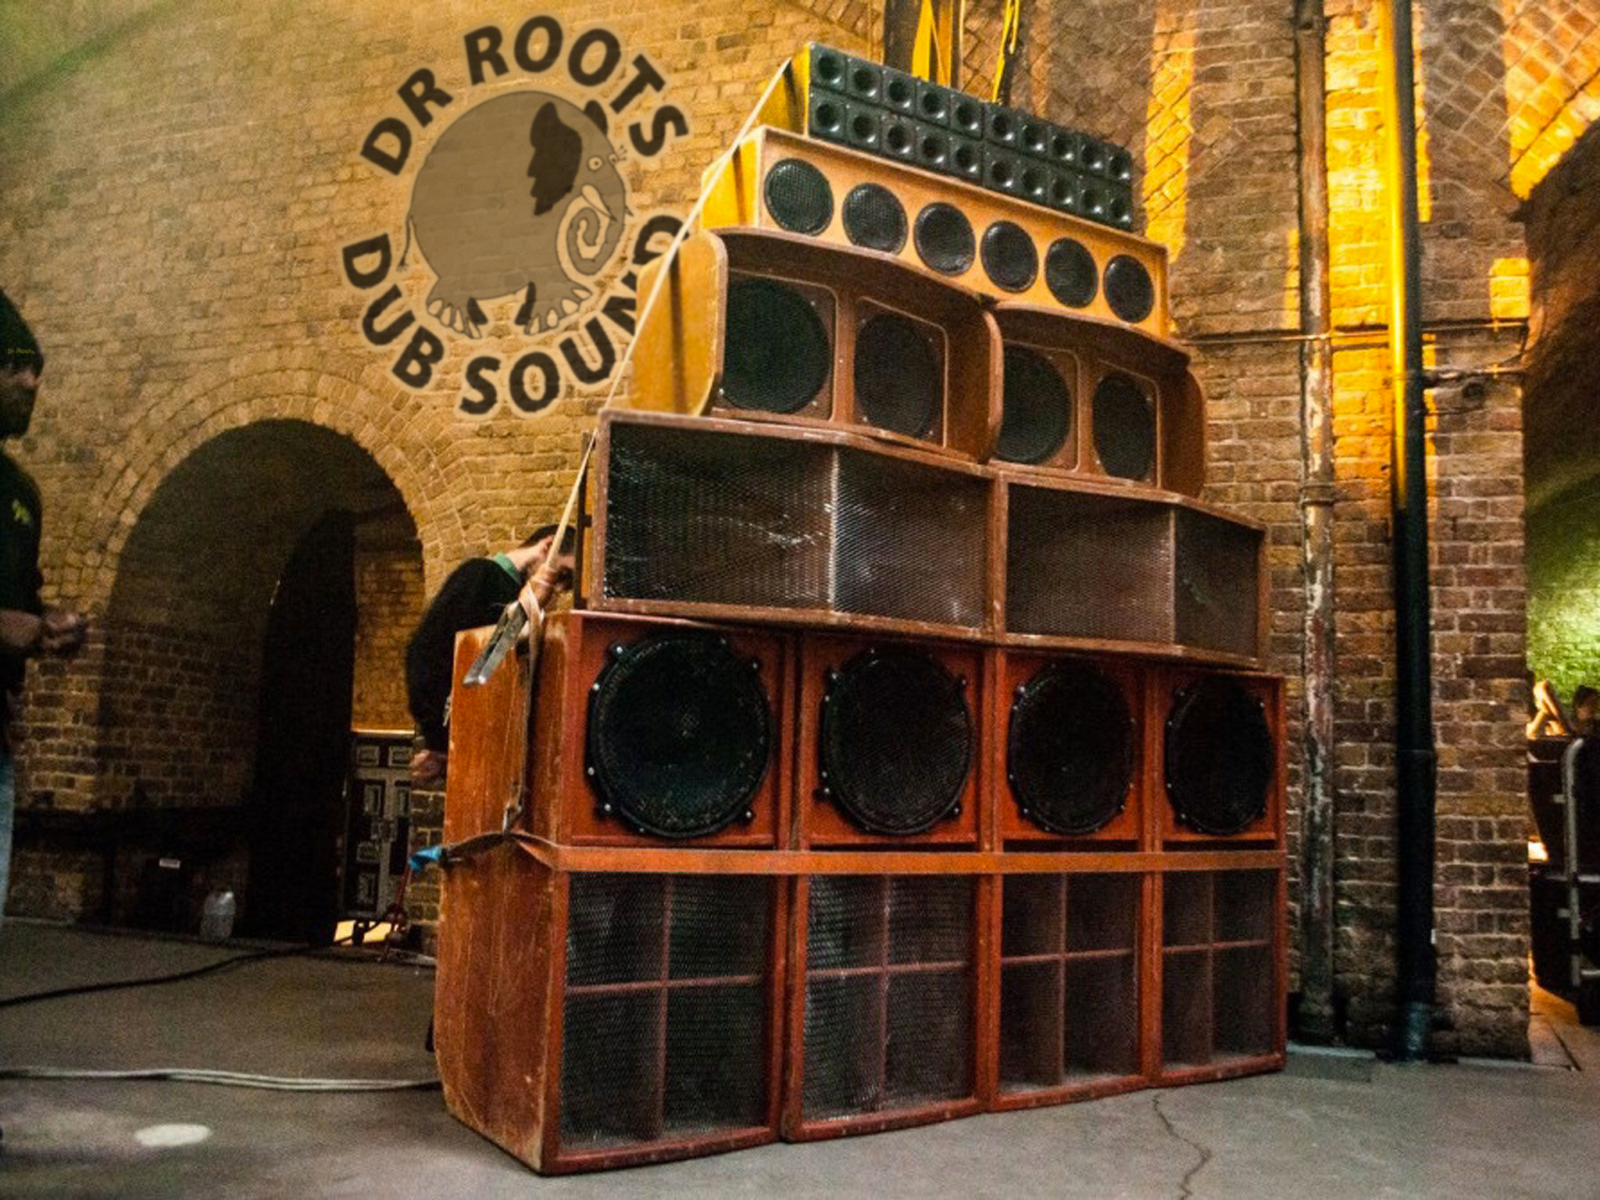 Dr Roots Dub Sound